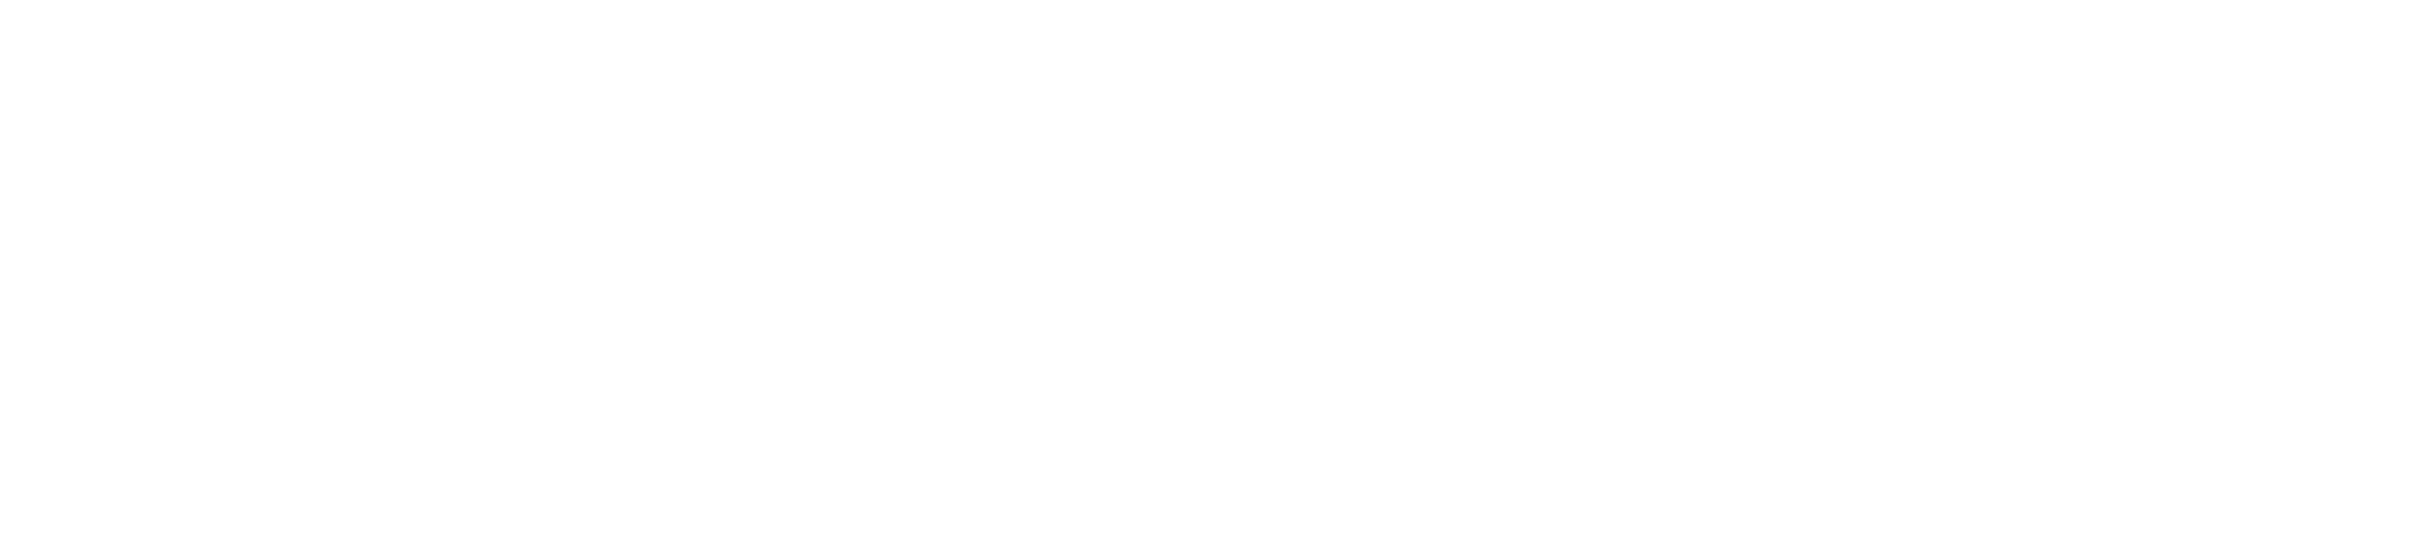 voyance magazine